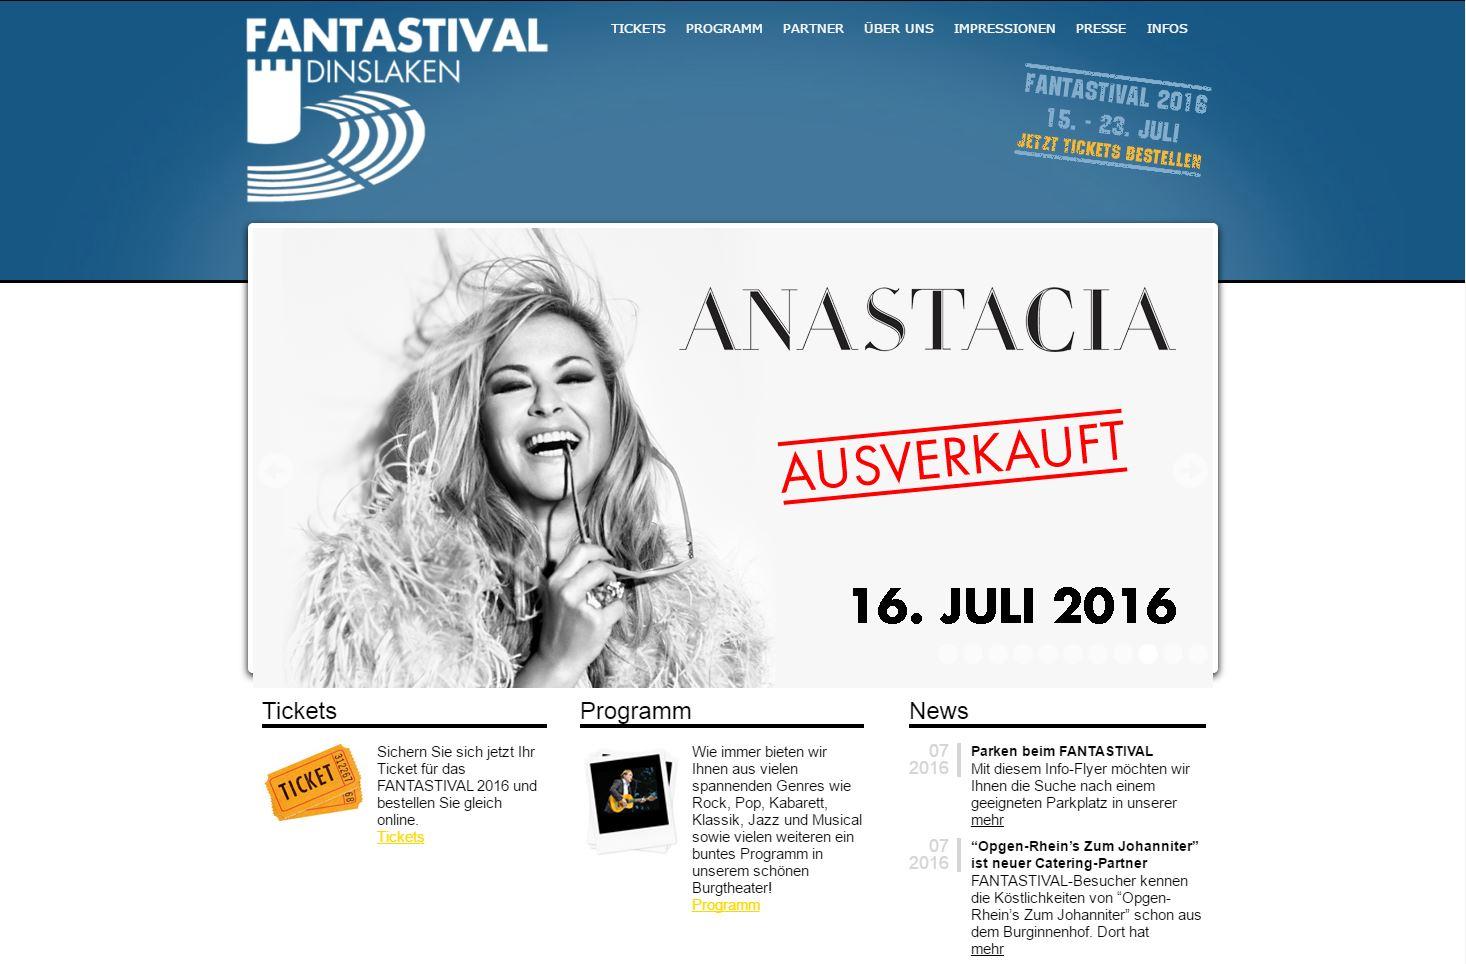 Webseite des Fantastival